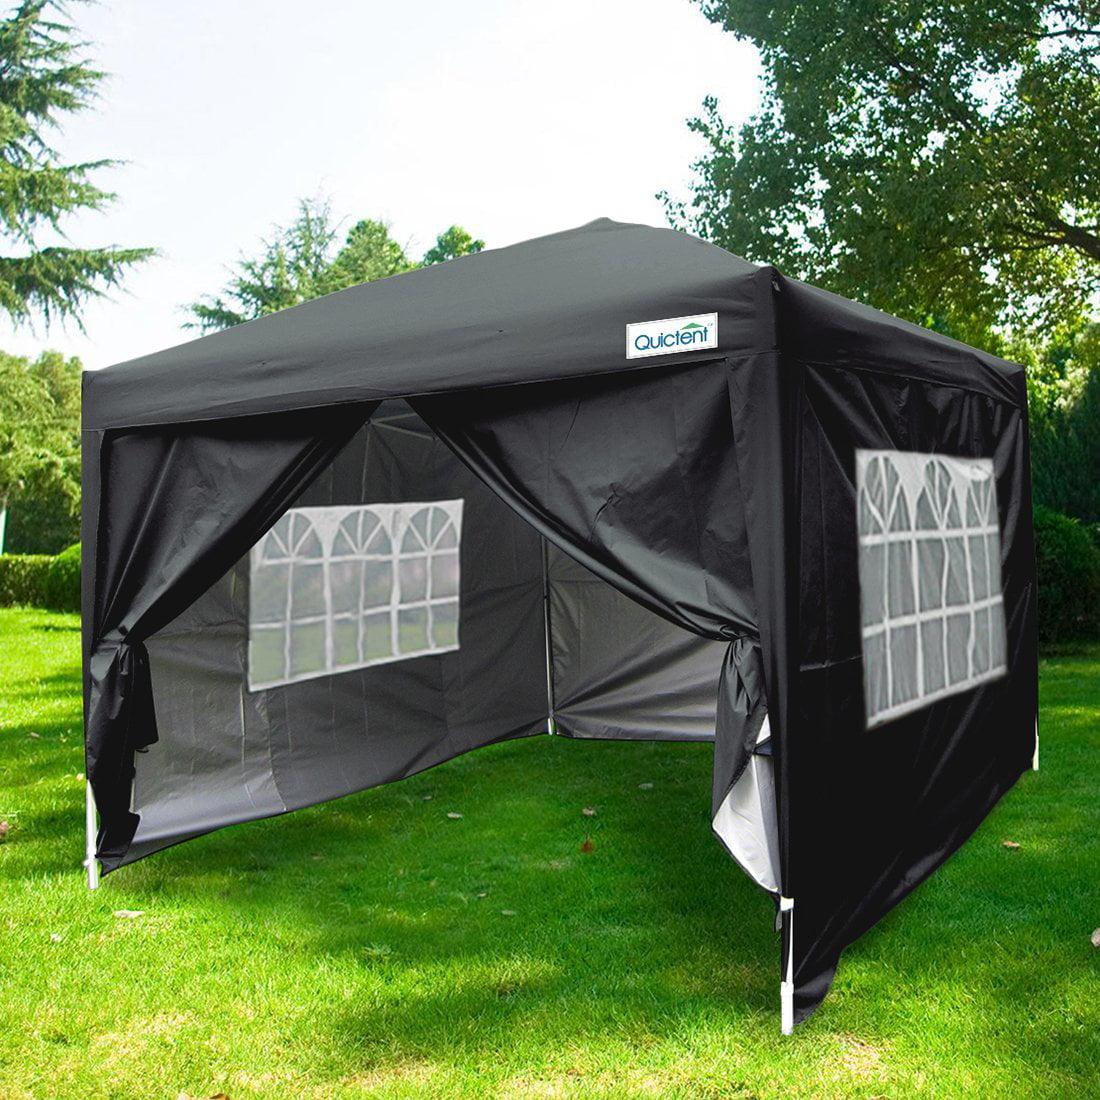 Quictent Silvox Waterproof 8x8' EZ Pop Up Canopy Gazebo Party Tent